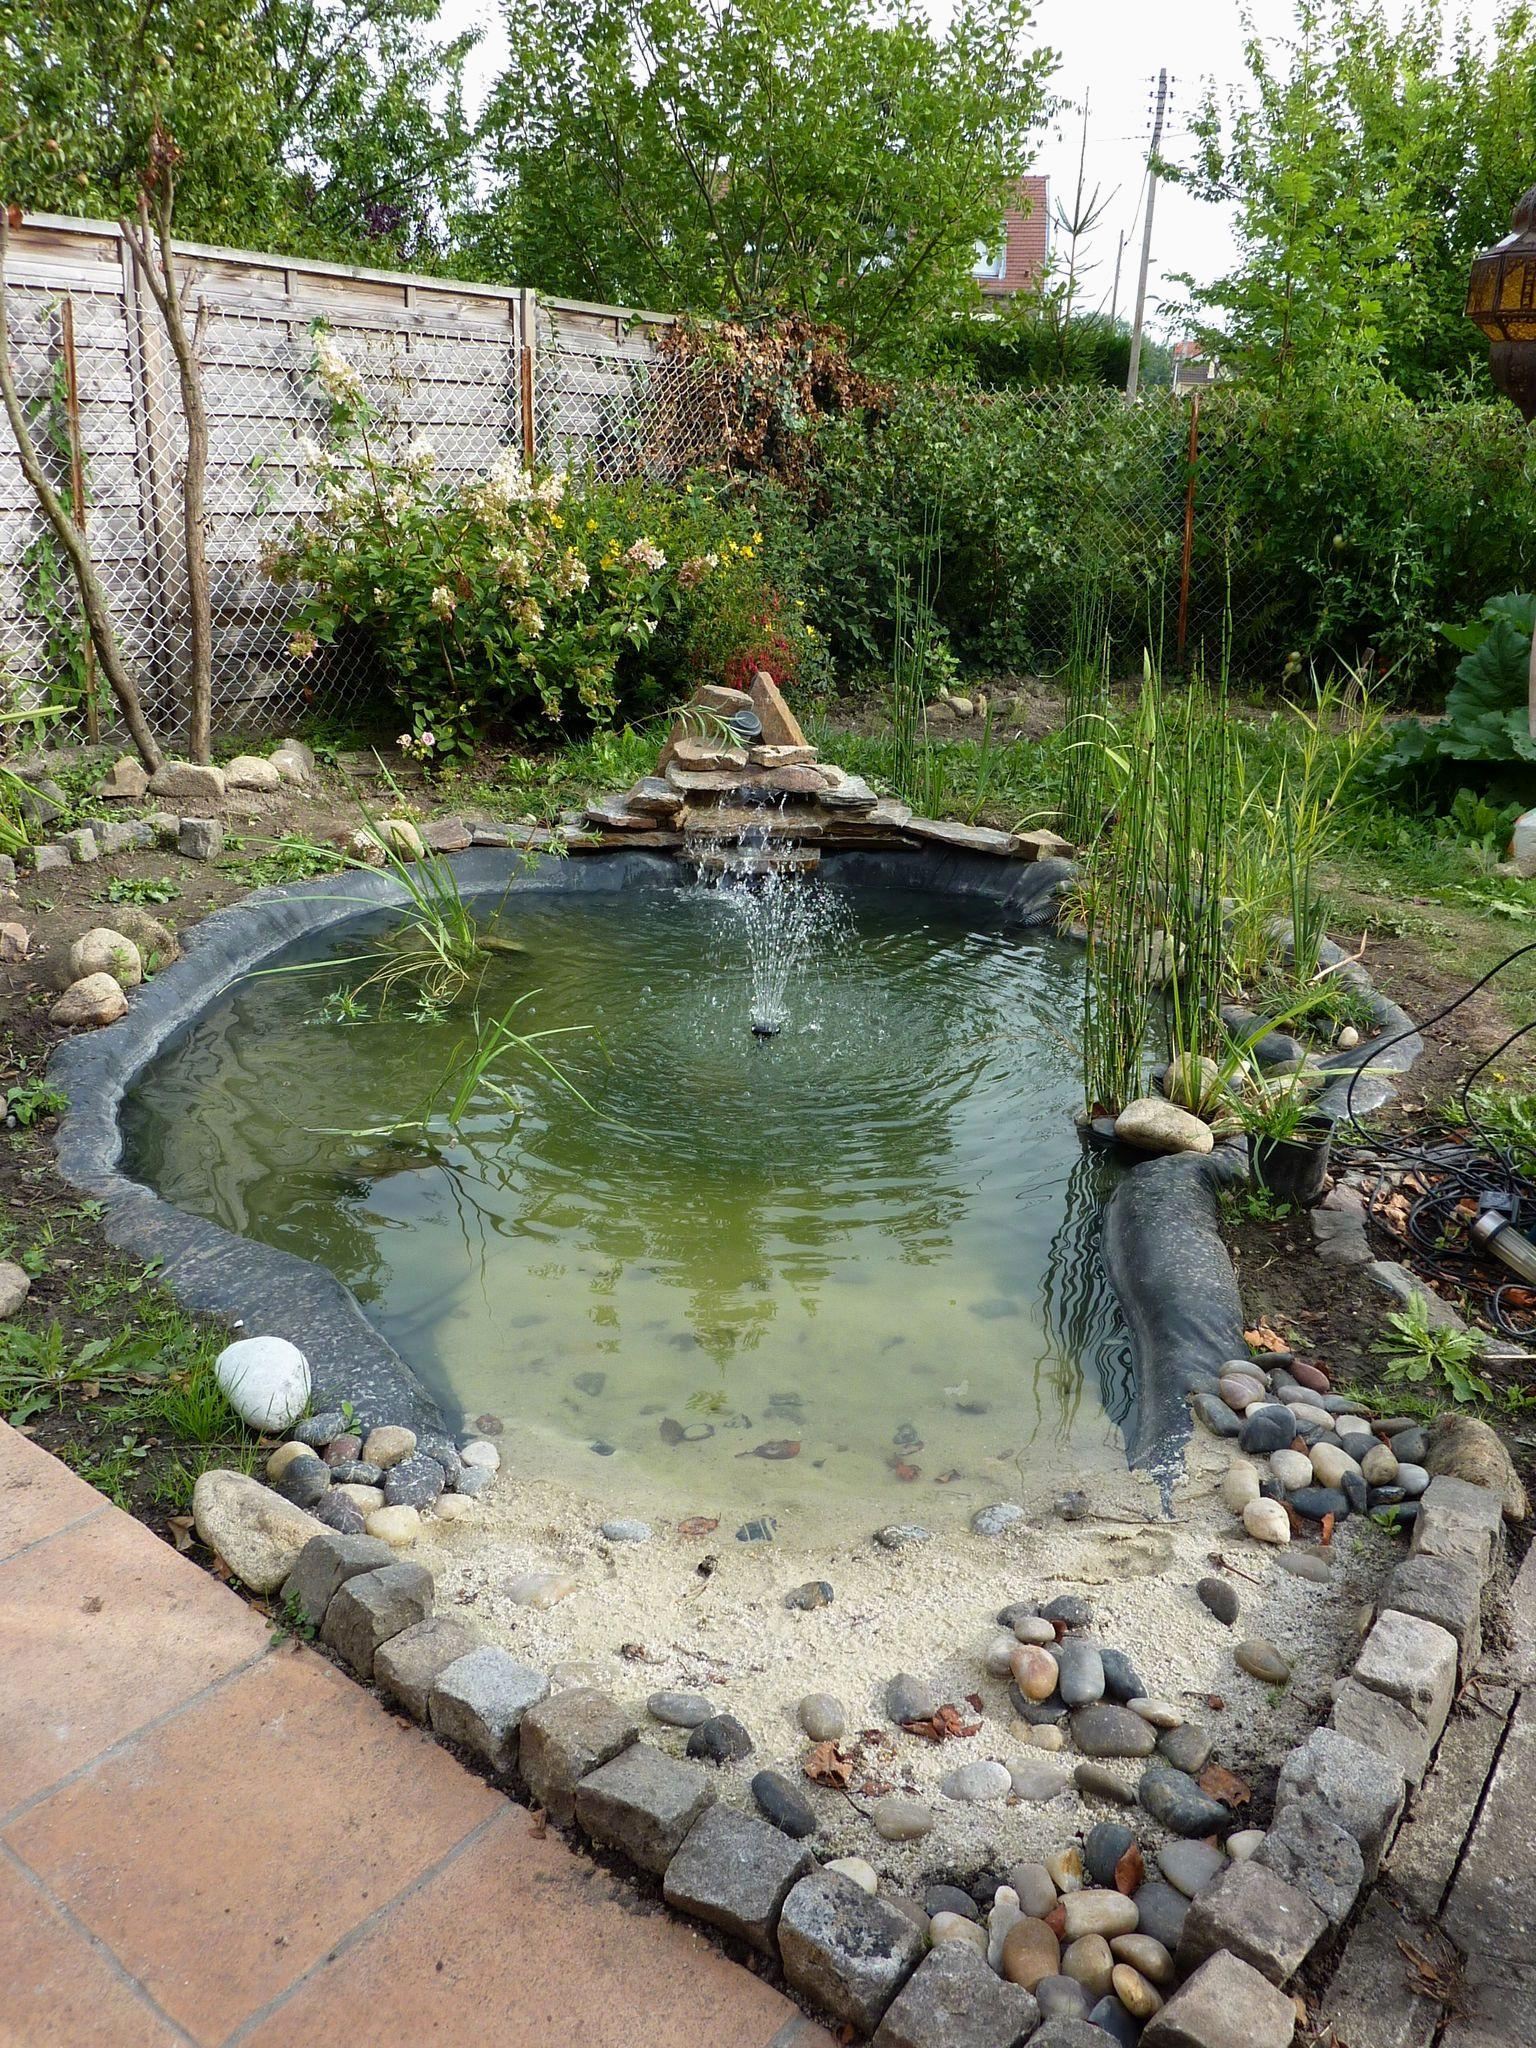 Petit Bassin De Jardin Pas Cher Nouveau 39 Bassin De Jardin ... intérieur Petit Bassin Pour Jardin